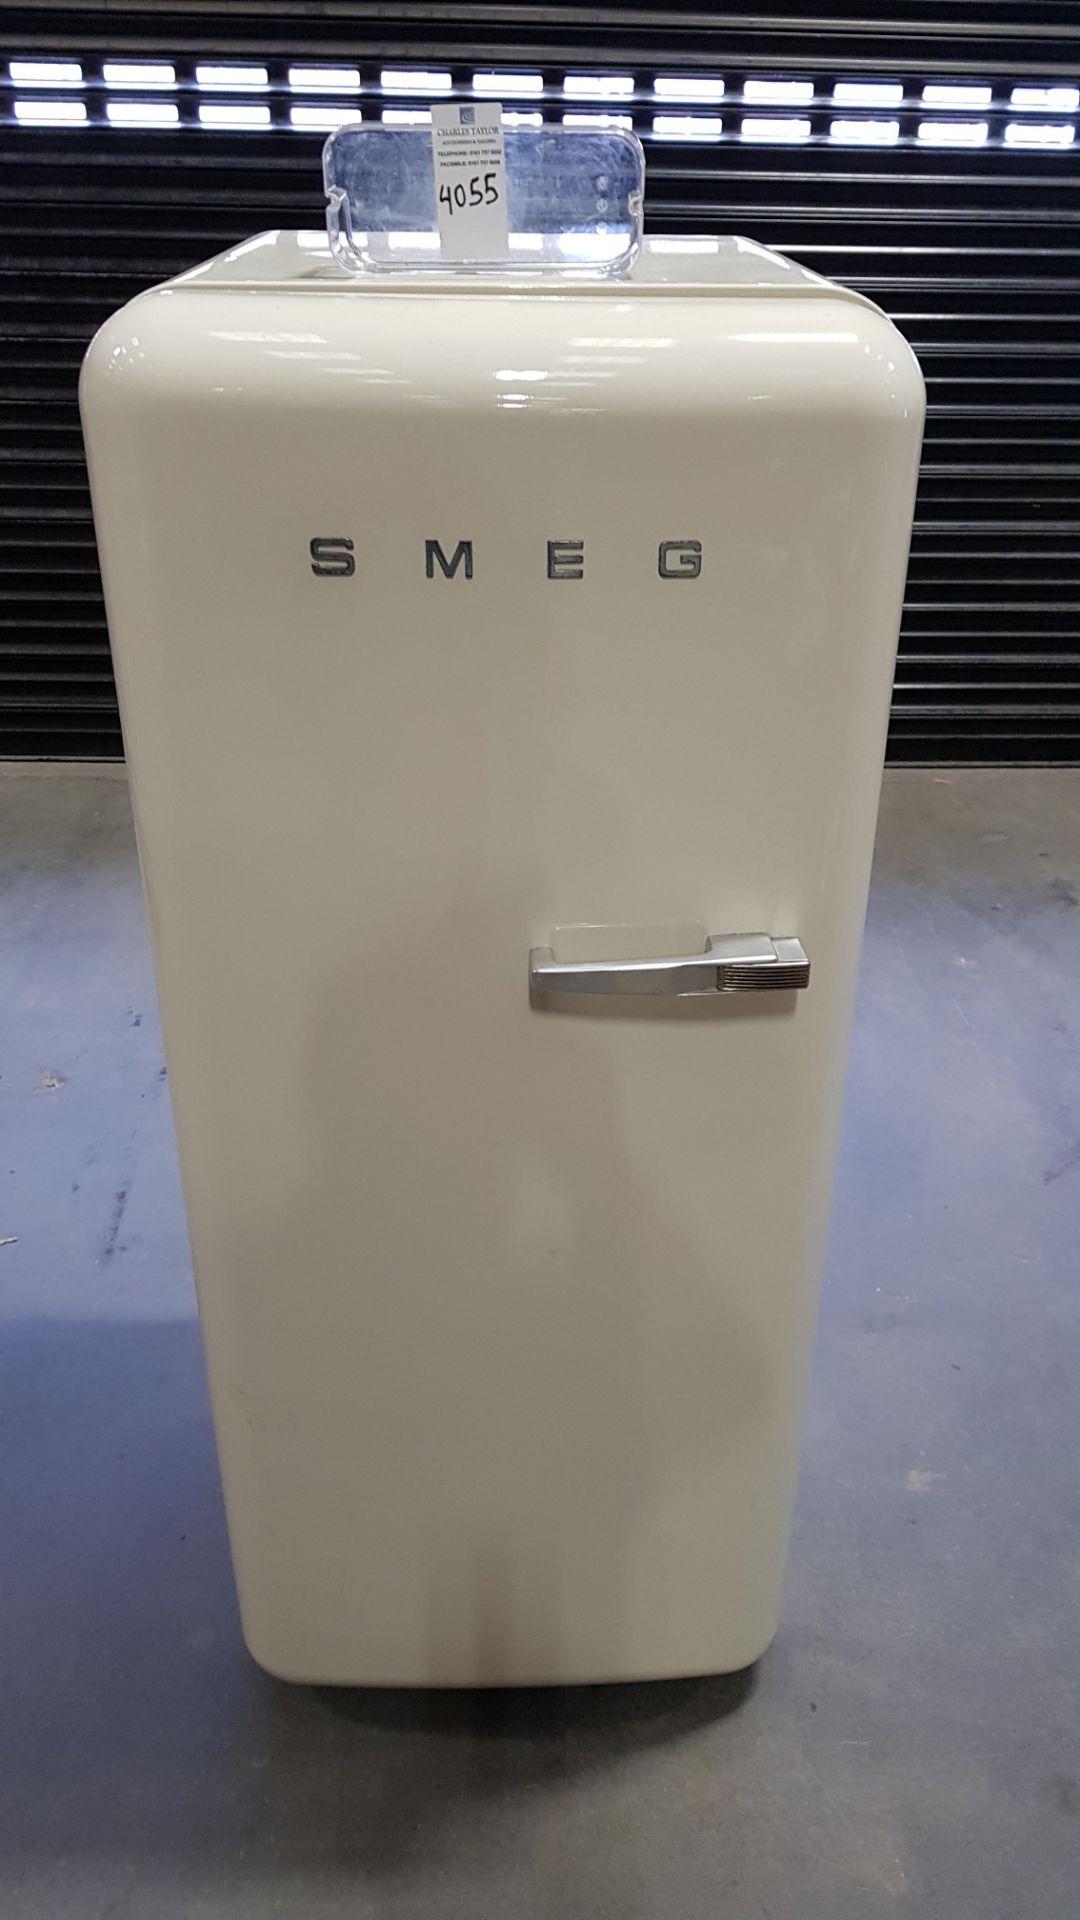 1 X (SMEG) CREAM FRIDGE WITH PLASTIC COMPARTMENTS WITHIN